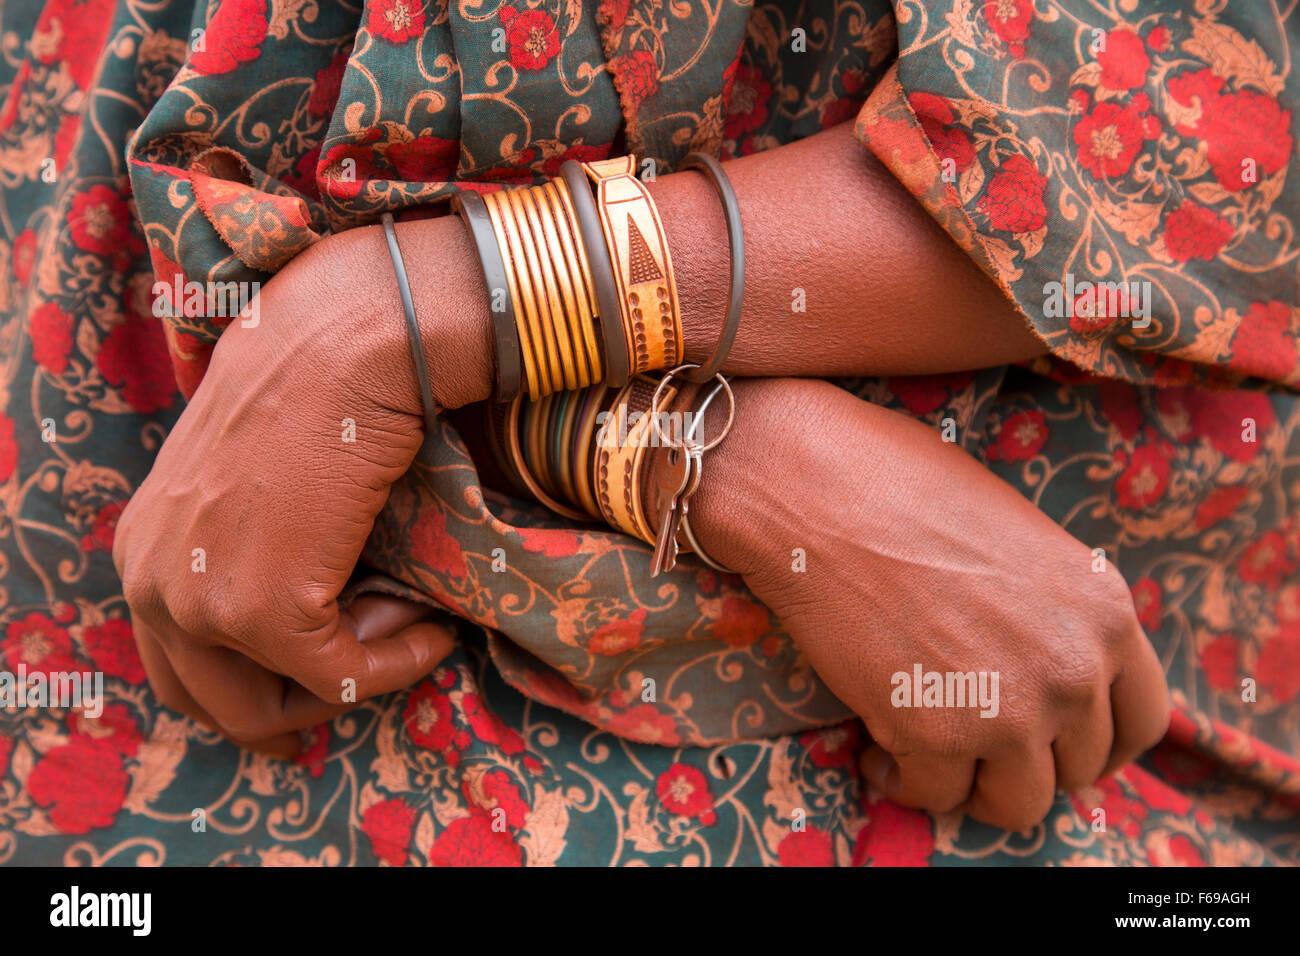 Himba woman's bracelets, Kaokoveld, Namibia, Africa - Stock Image